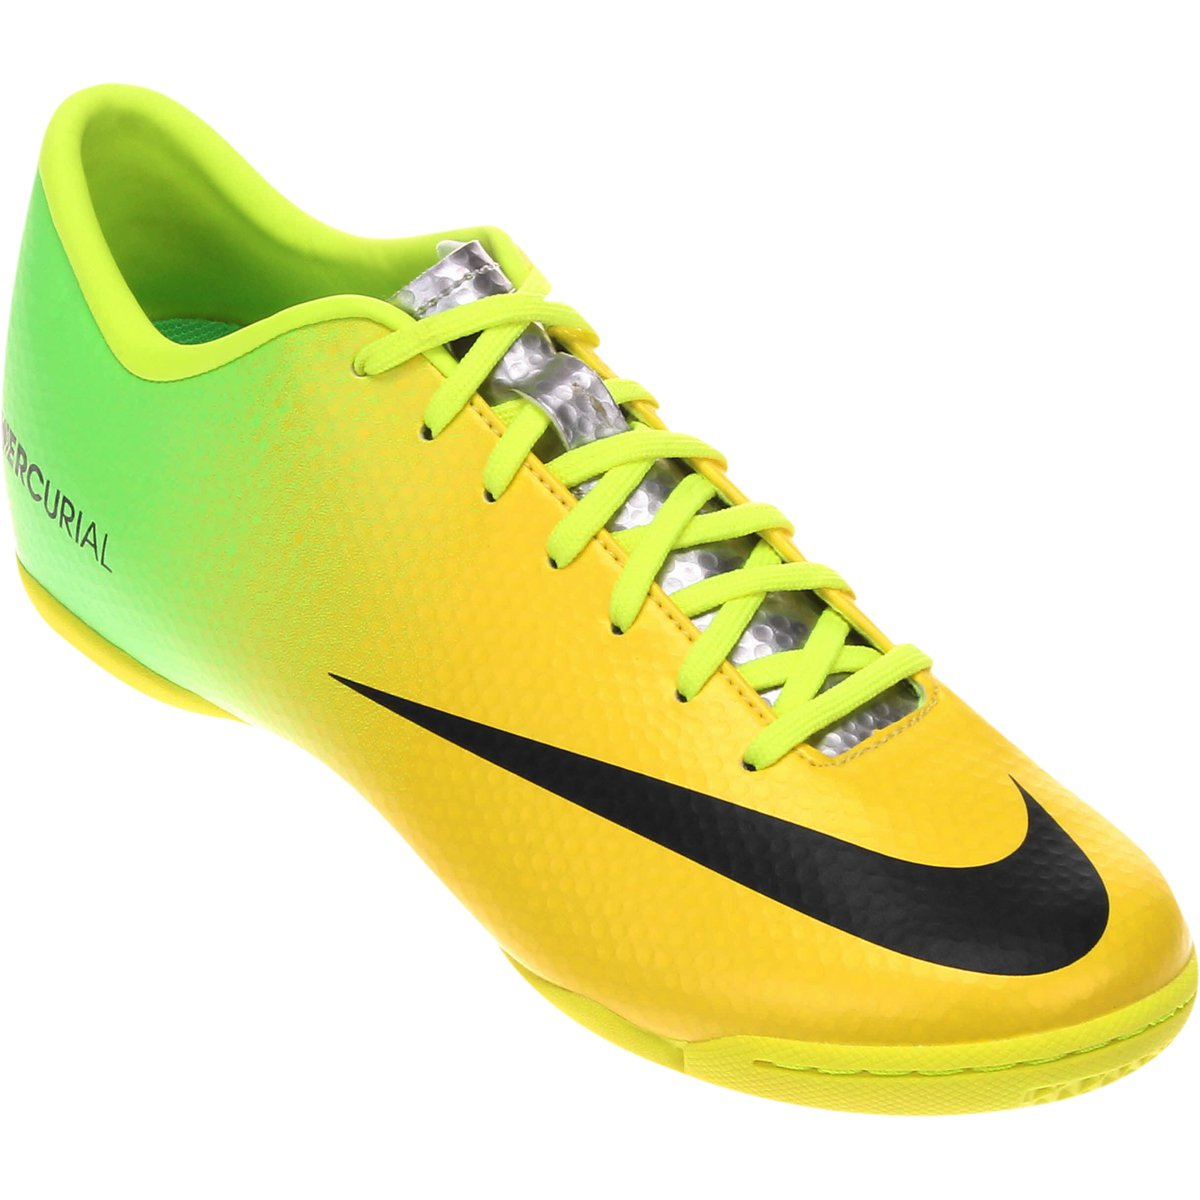 ad45e5c23b460 Chuteira Nike Mercurial Victory IV IC - Compre Agora